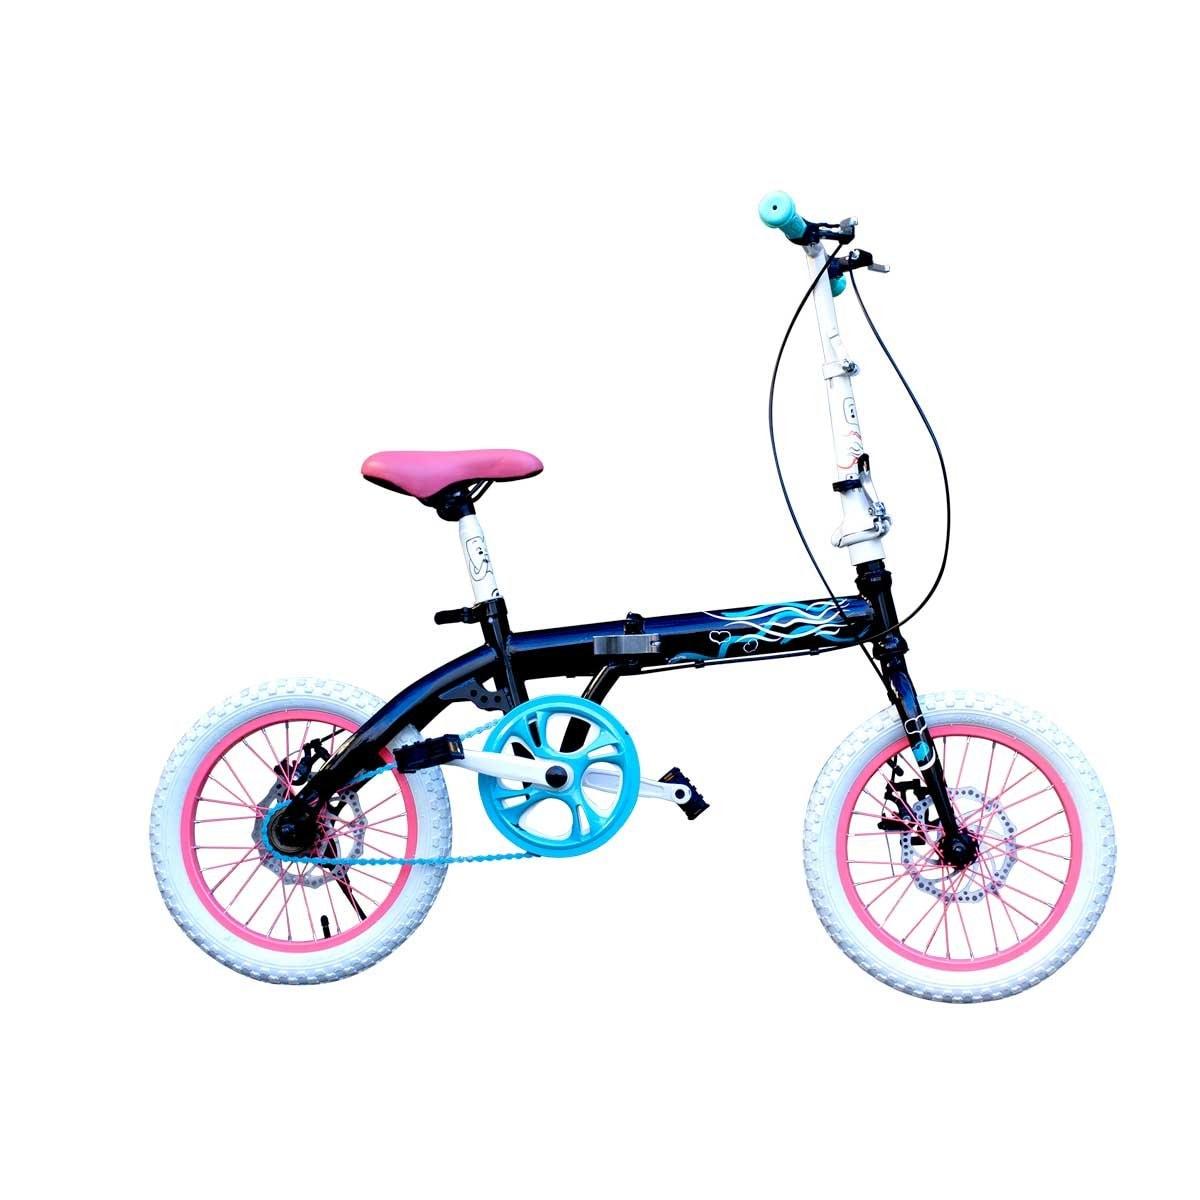 Bicicleta Plegable Bia Pat Avenue